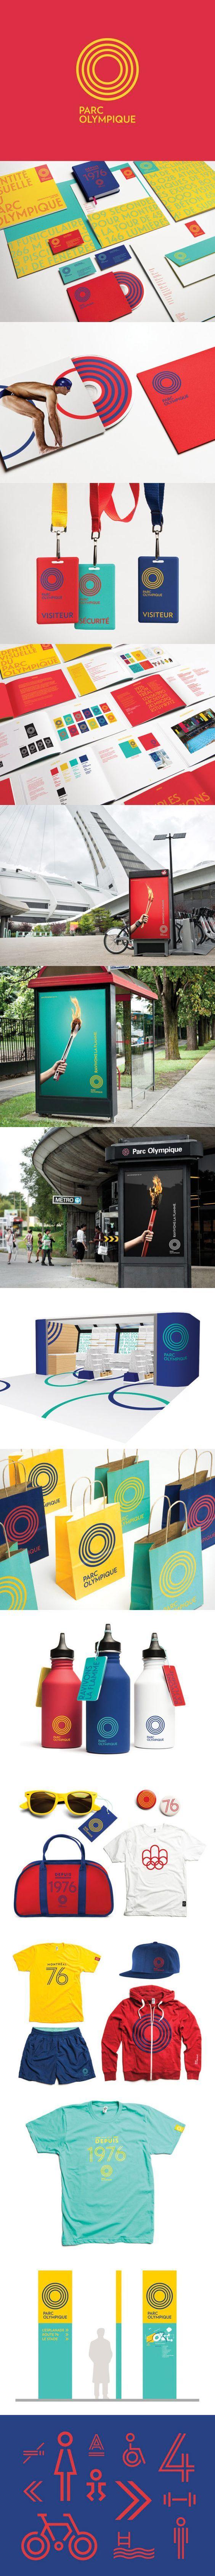 Montréal Olympic Park identity by lg2 | Fivestar Branding – Design and Branding Agency & Inspiration Gallery